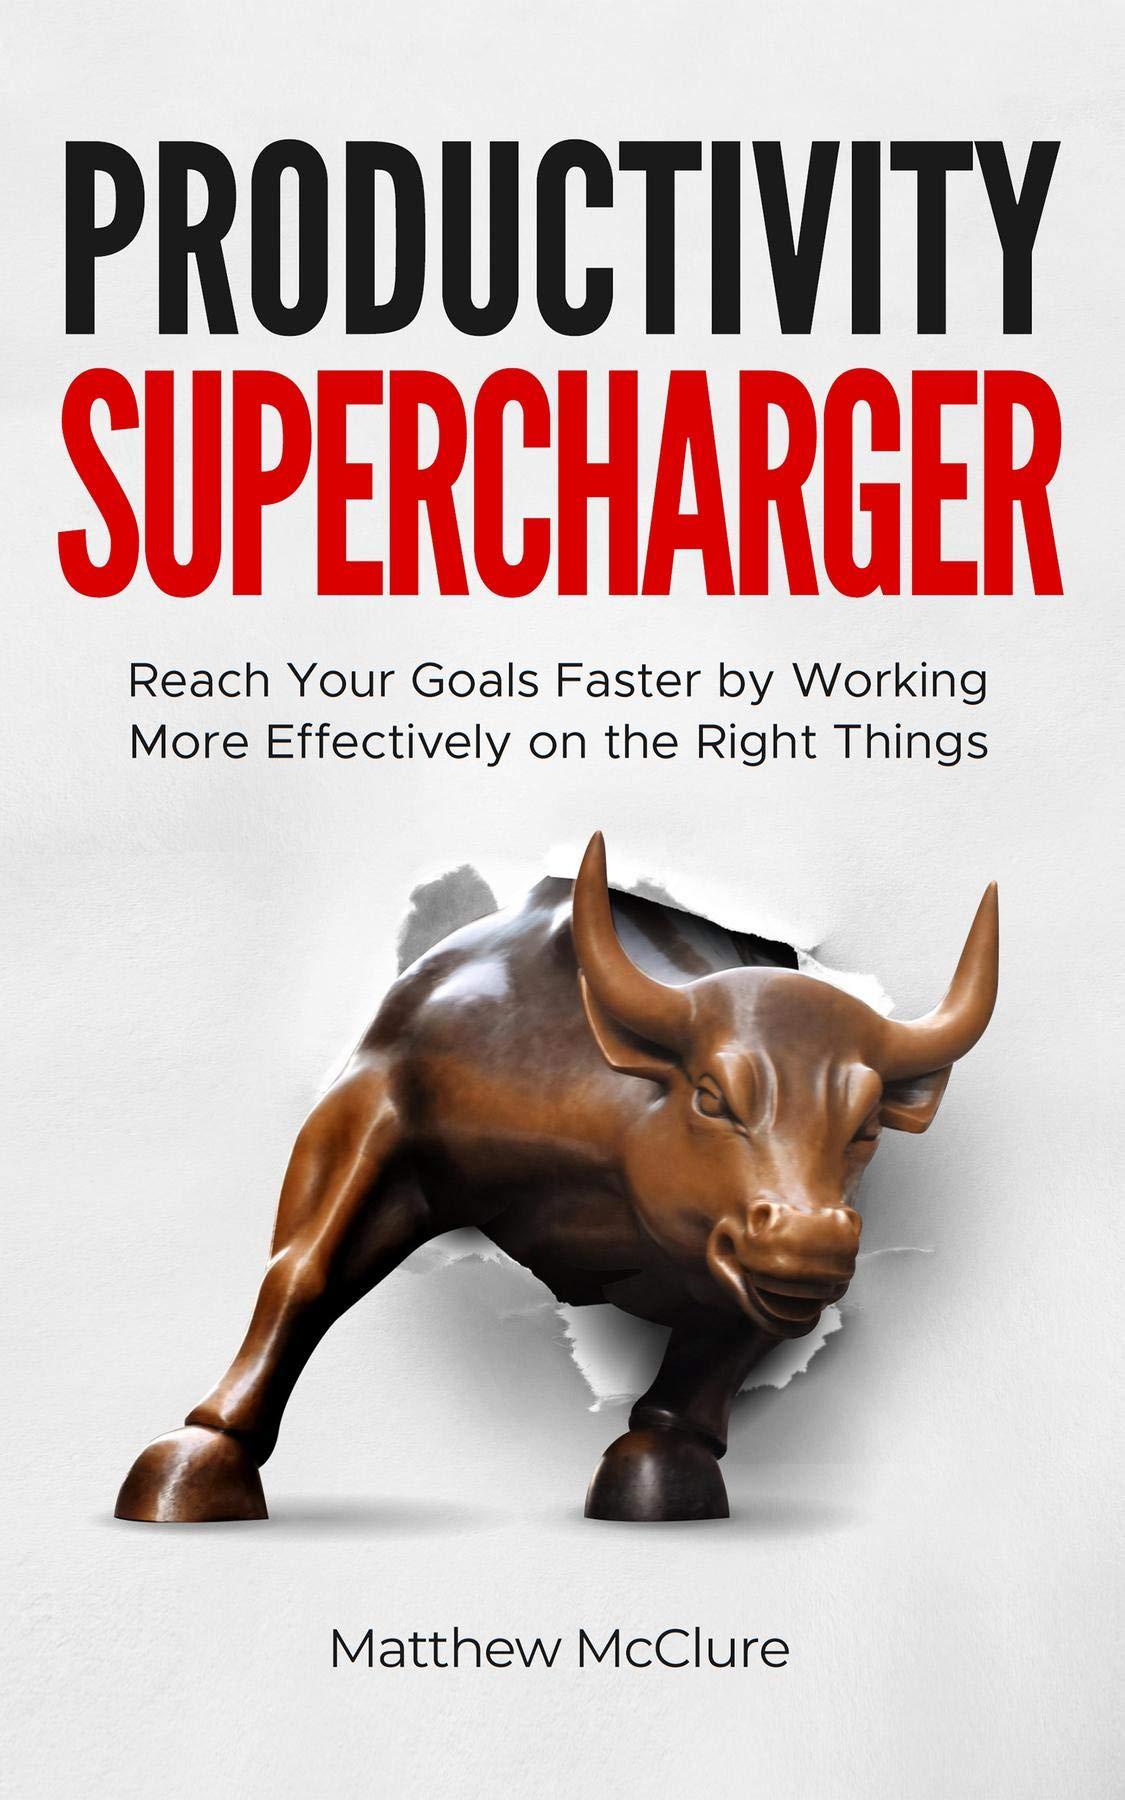 Productivity Supercharger